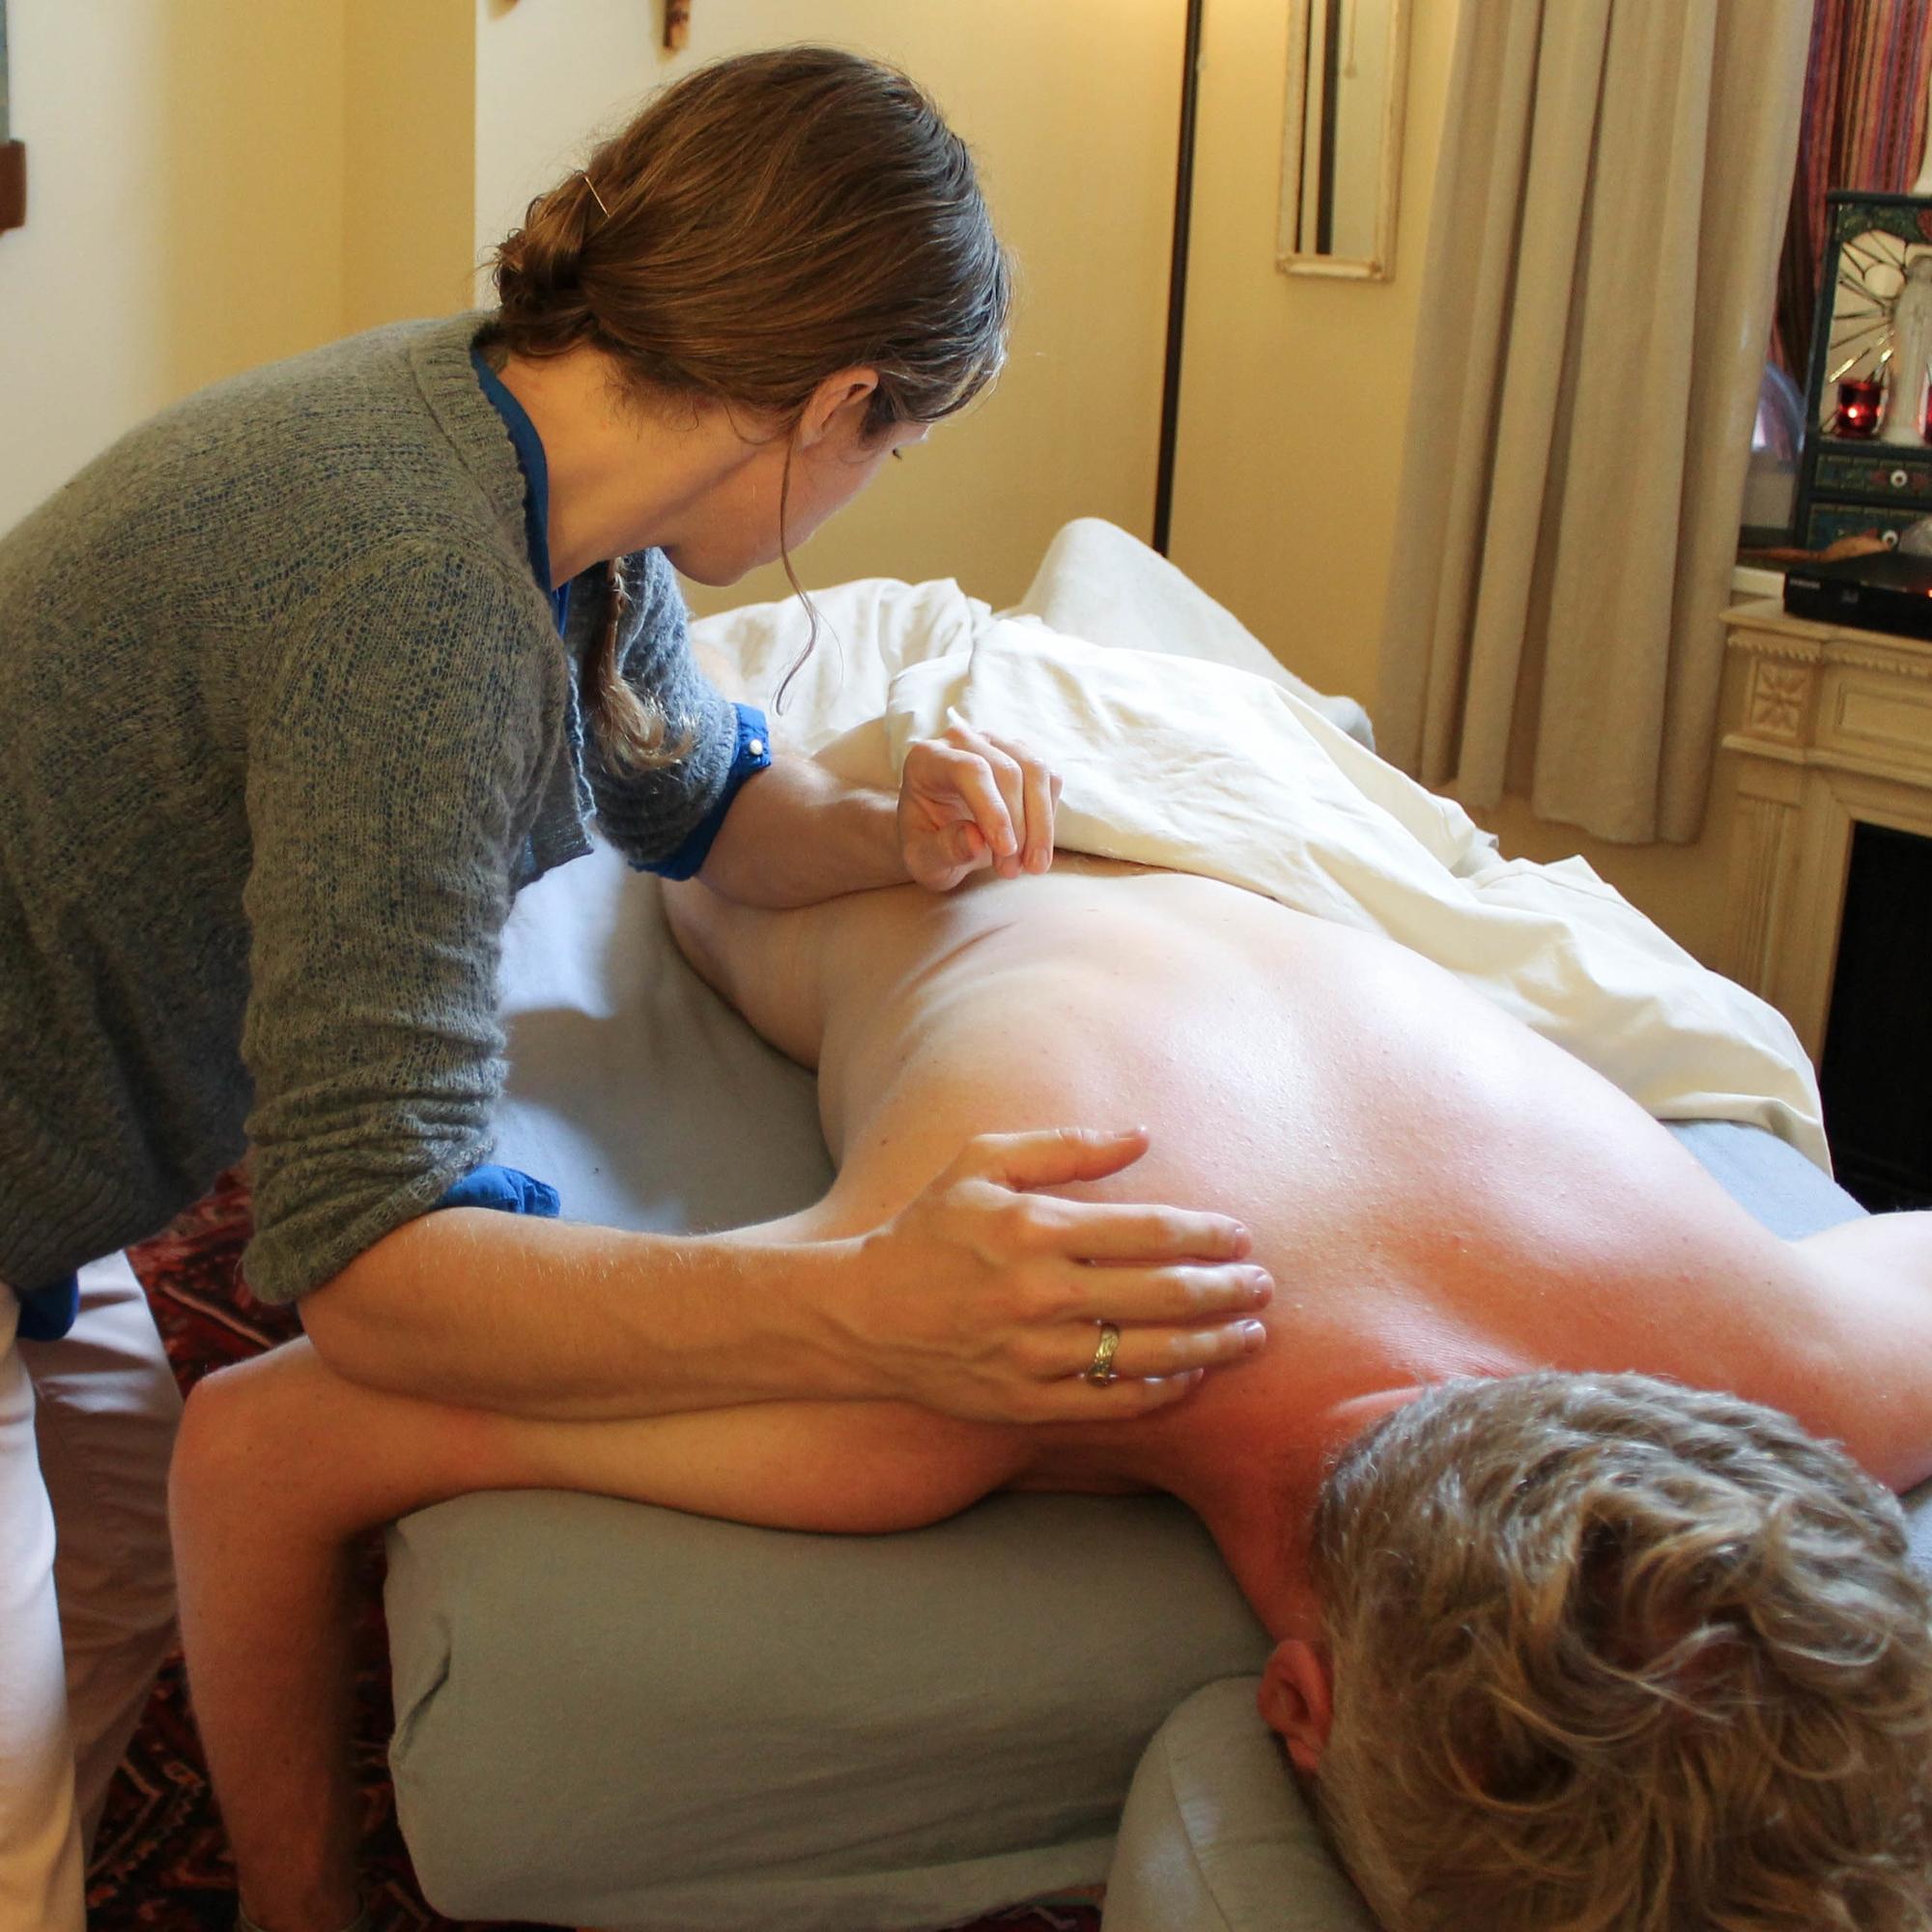 2015.08 KM in studio massage shoot (53 of 81).jpg